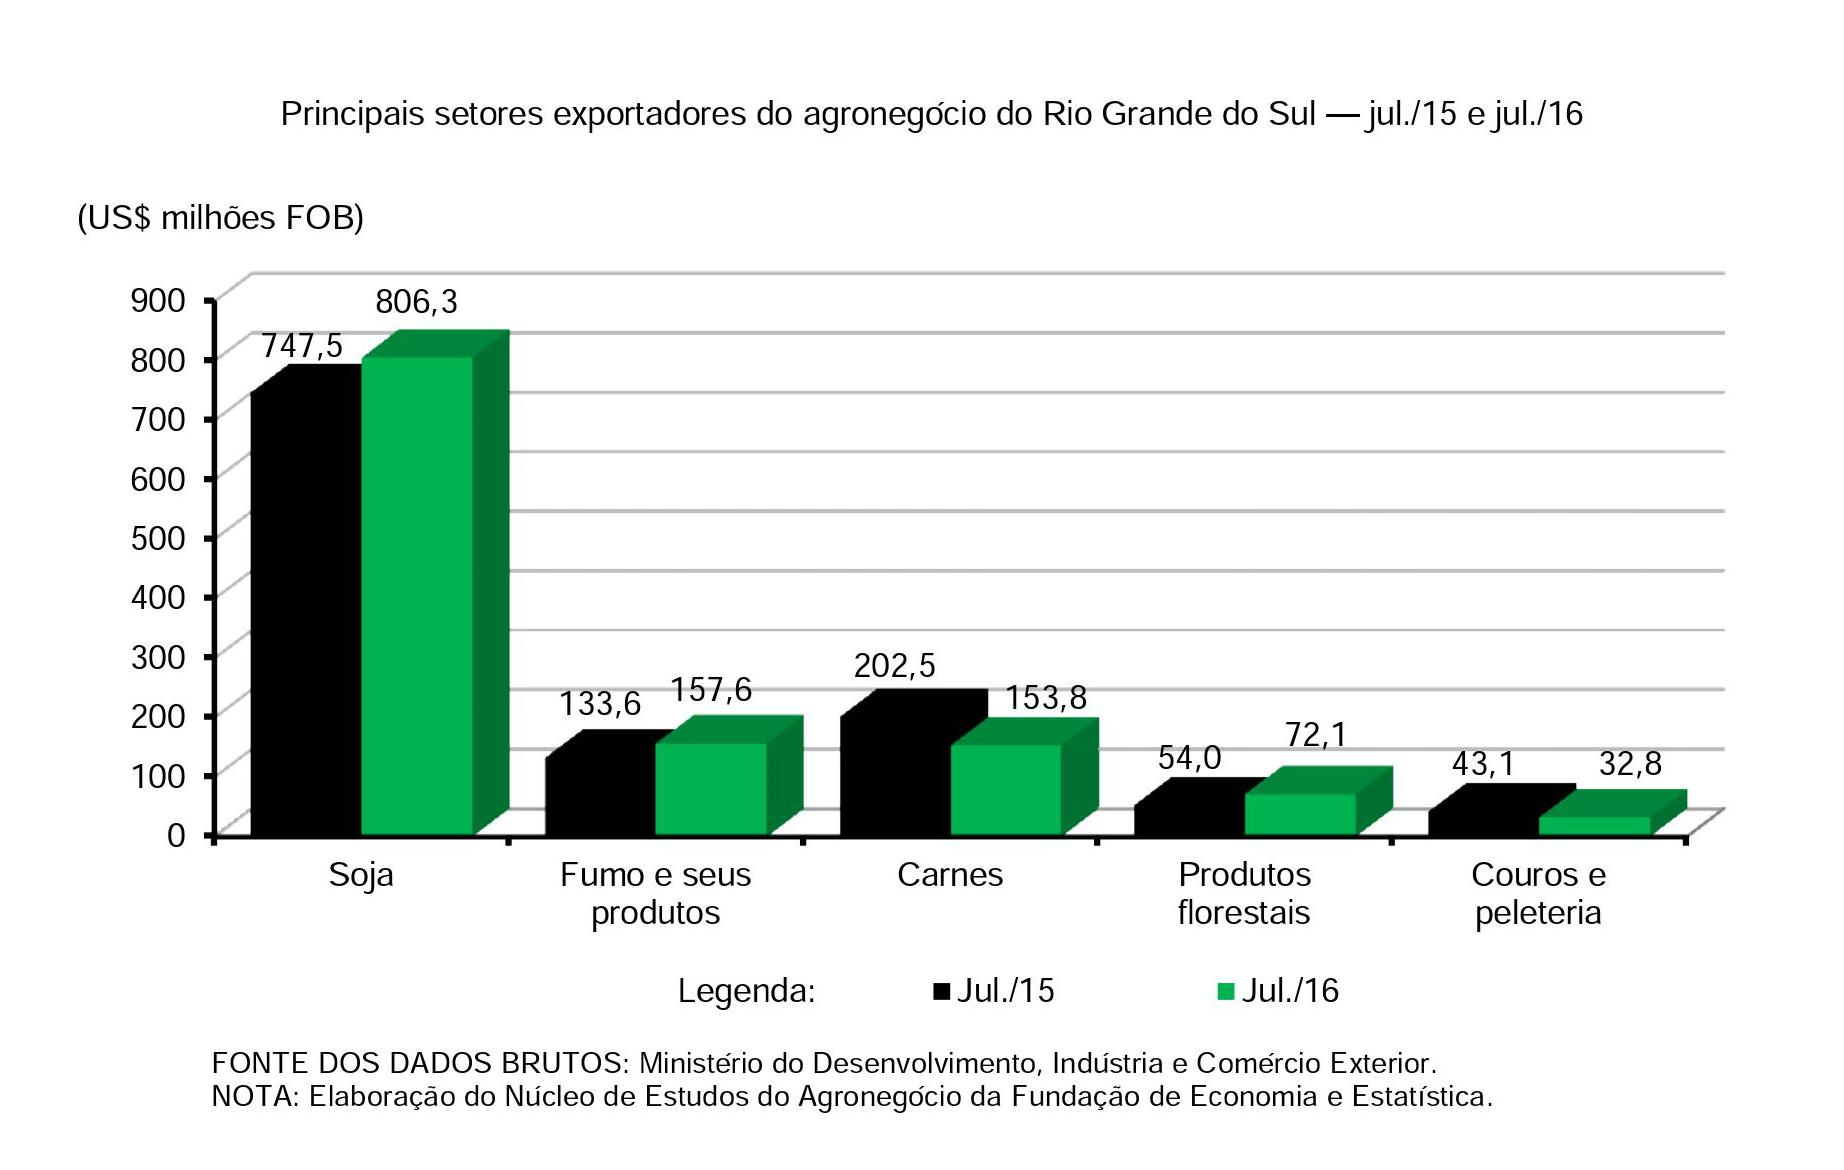 Principais setores exportadores do agronegócio do Rio Grande do Sul — jul.15 e jul.16